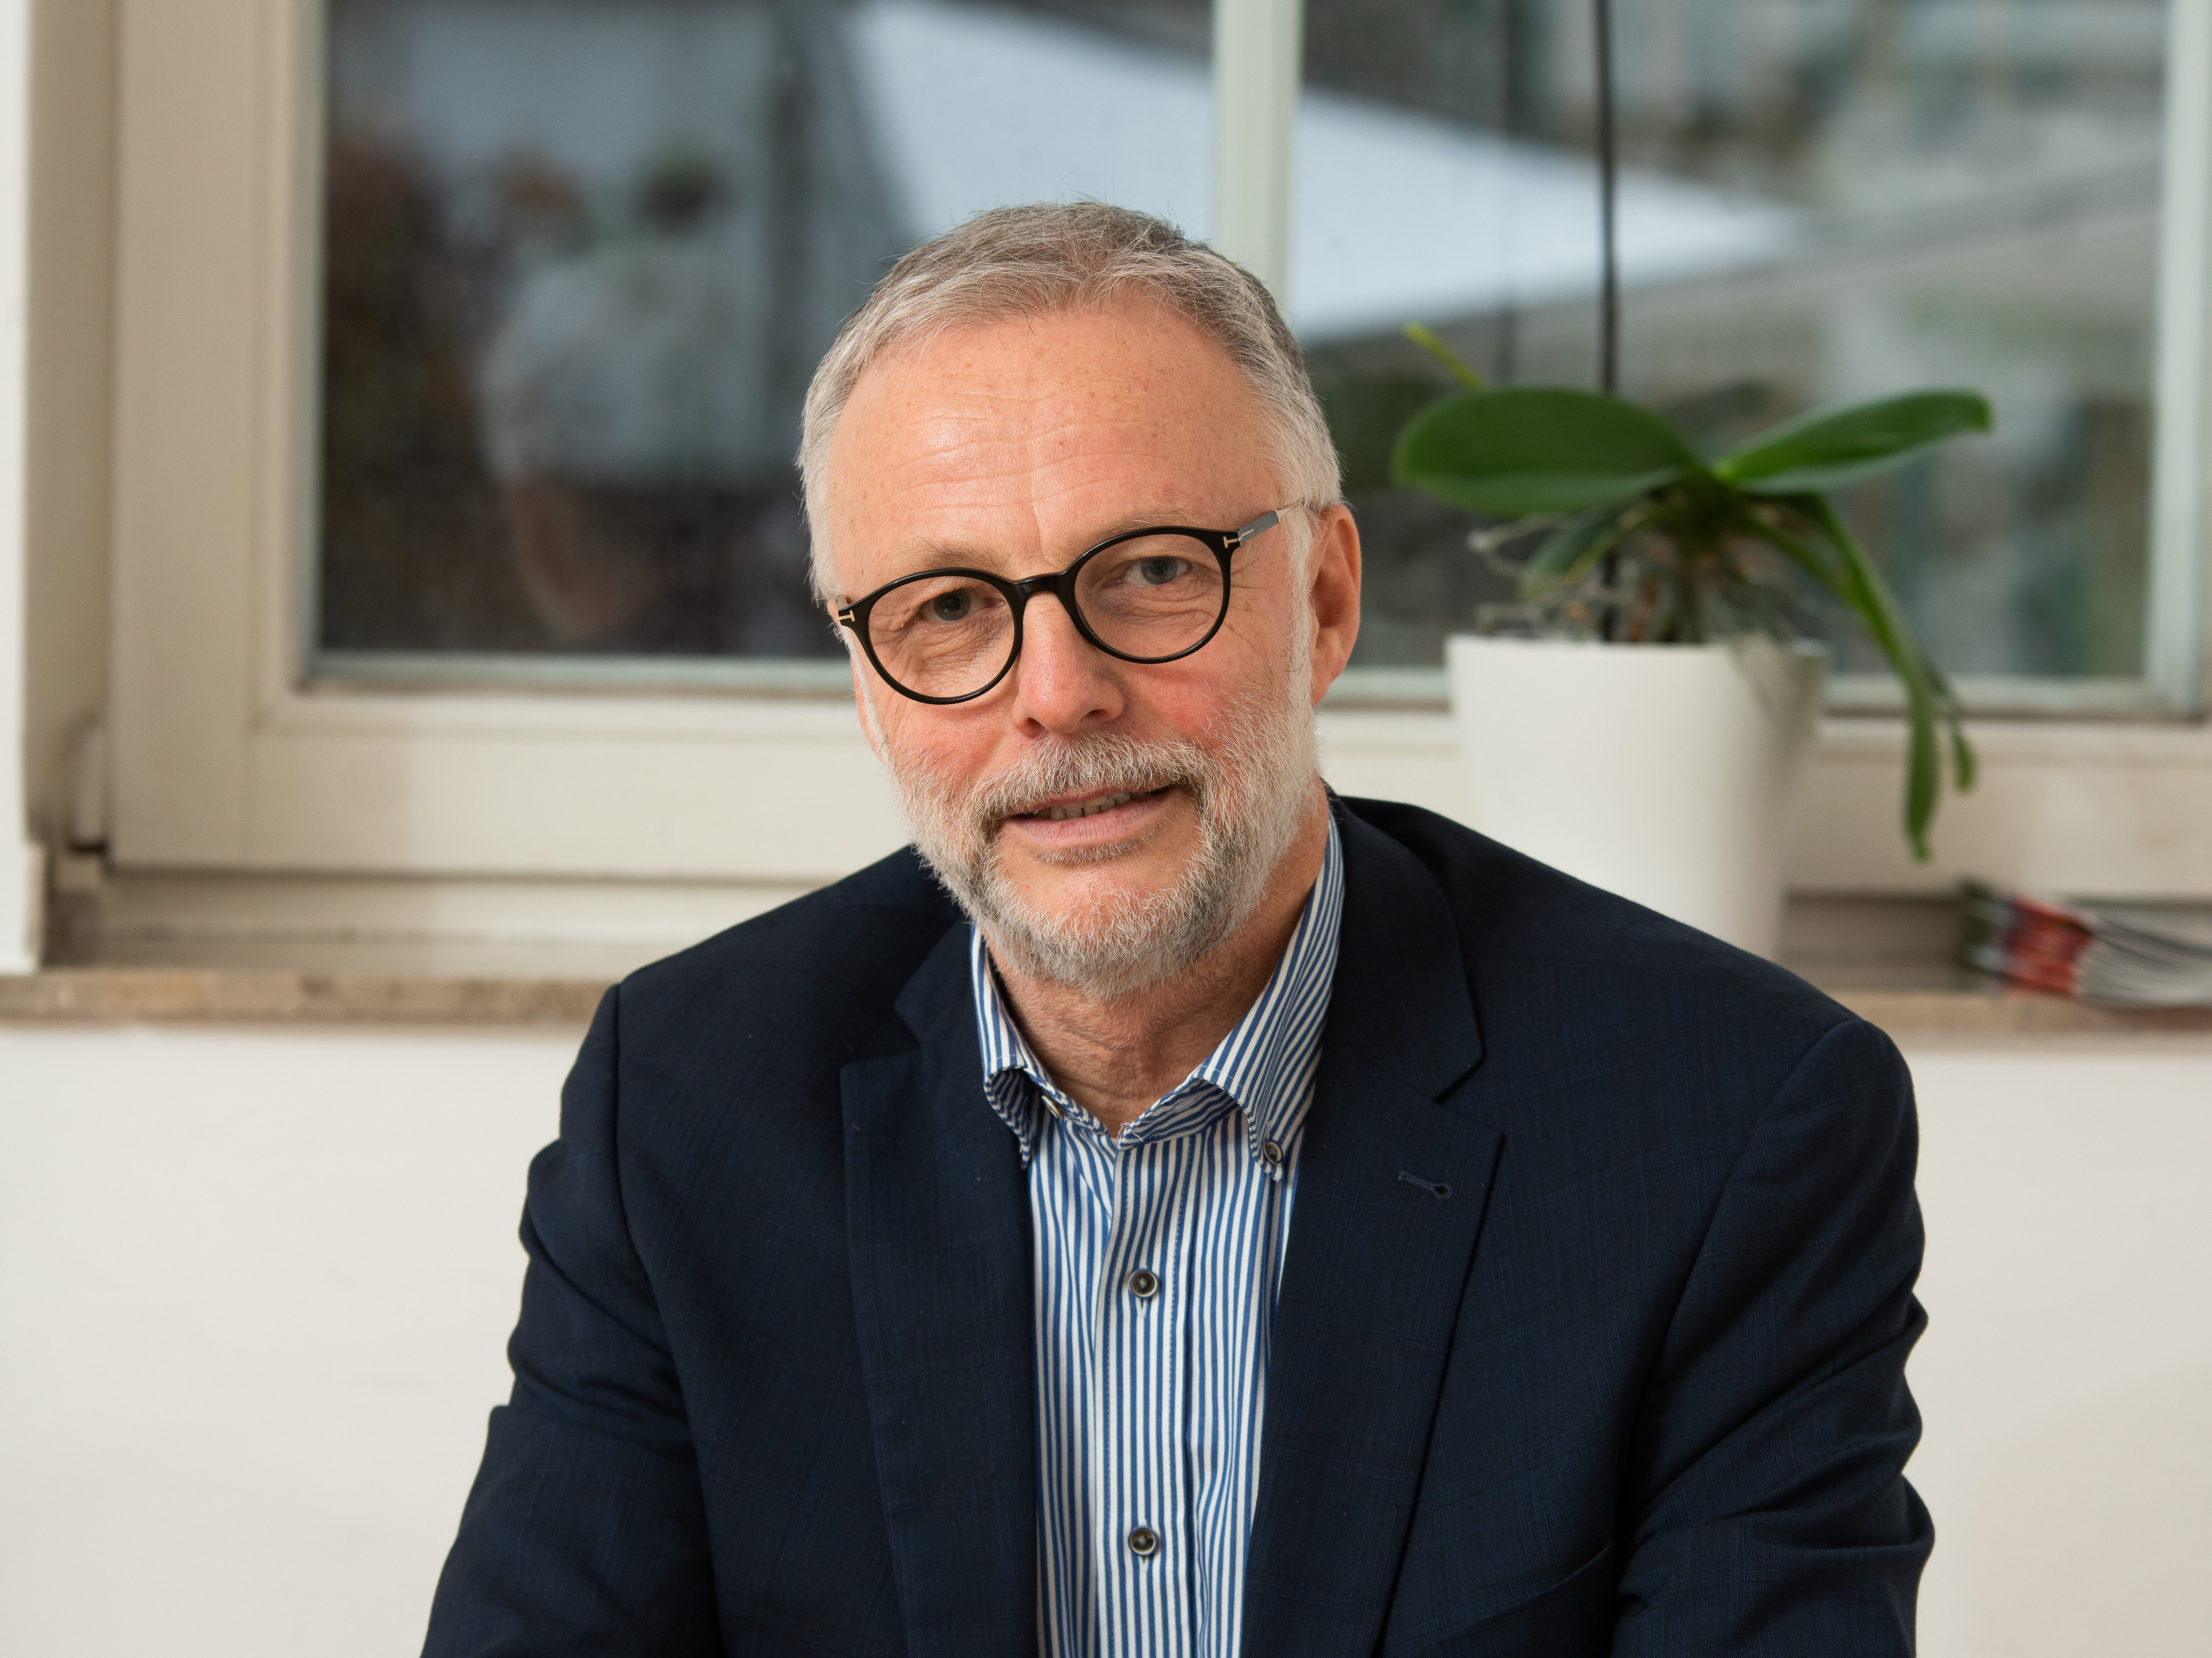 Bürgermeister Matthias Müller bei den Hertener Gesprächen